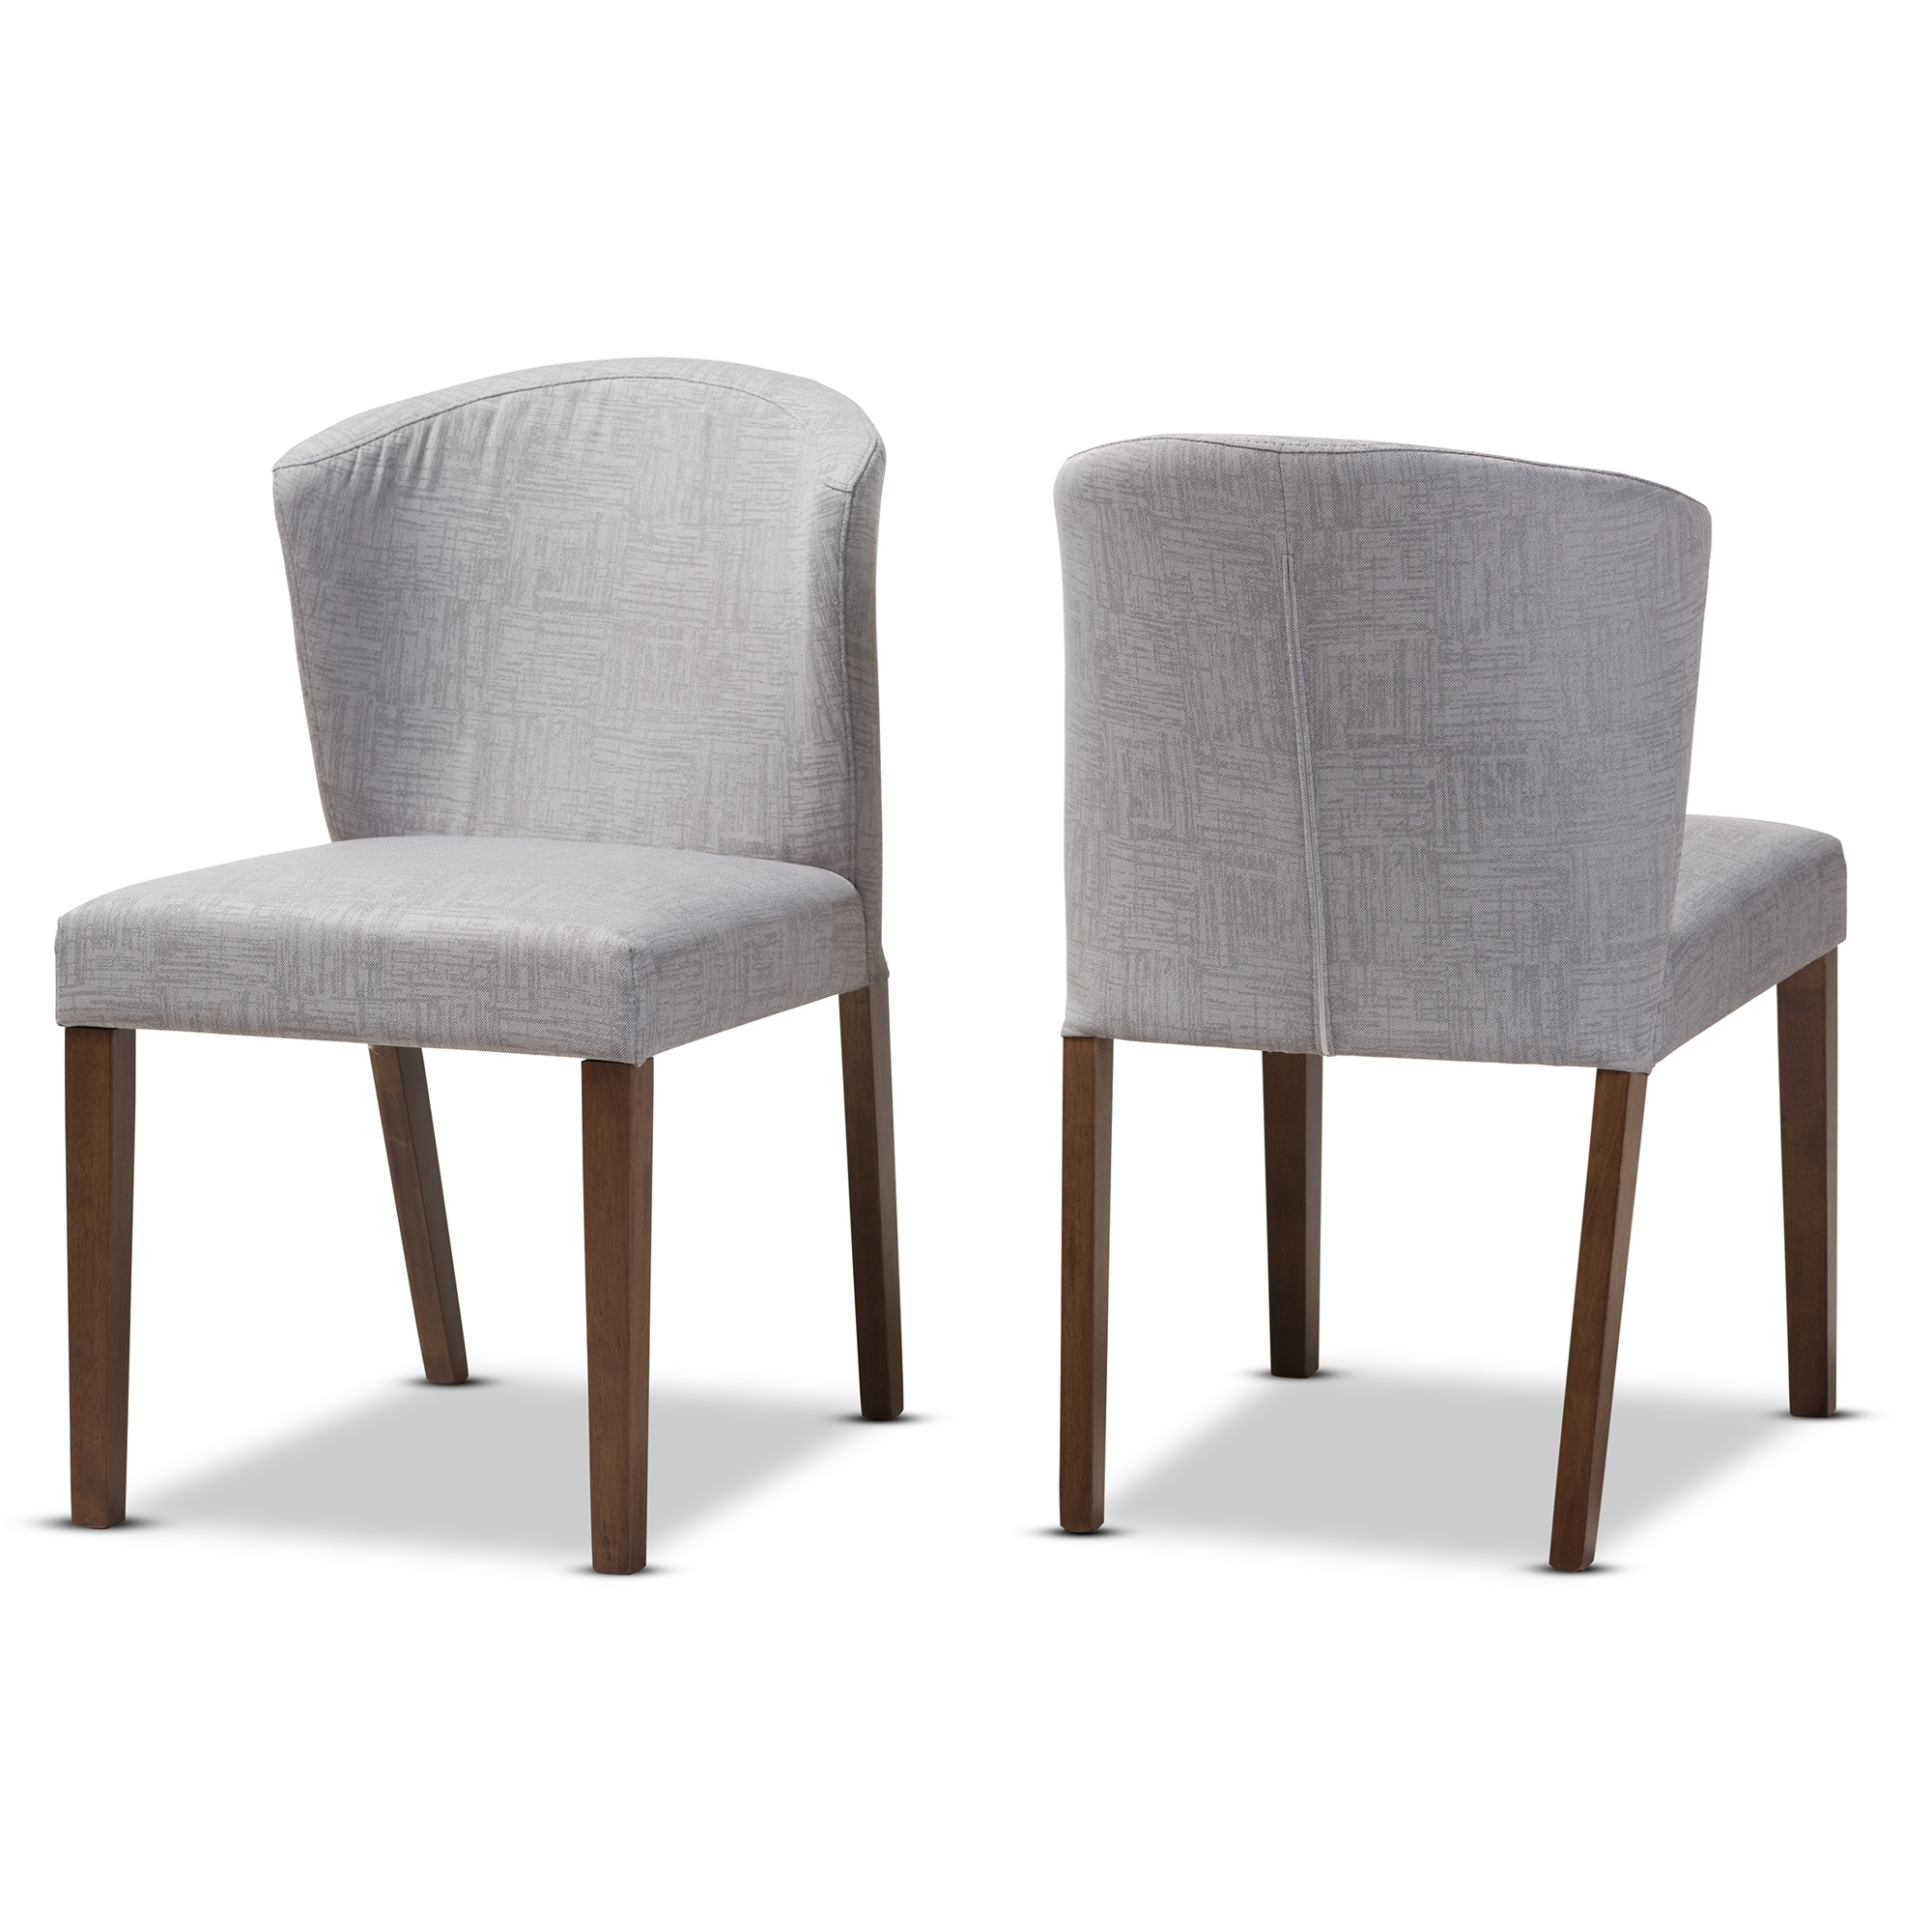 baxton studio cassie midcentury modern walnut wood light grey fabric dining chair affordable modern